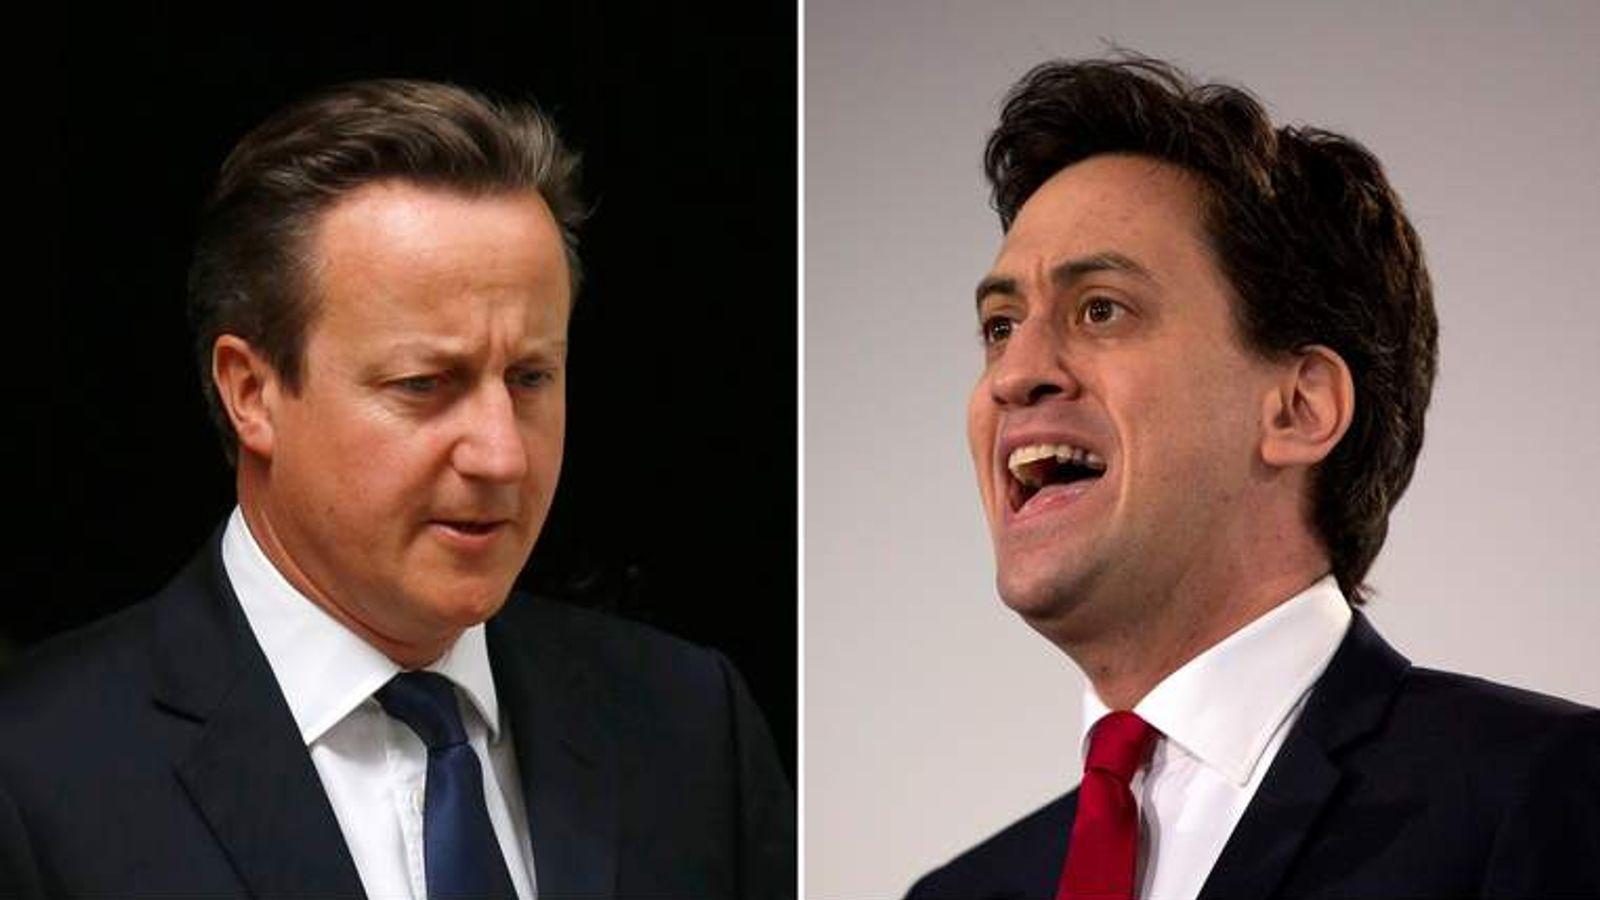 David Cameron (L) and Ed Miliband